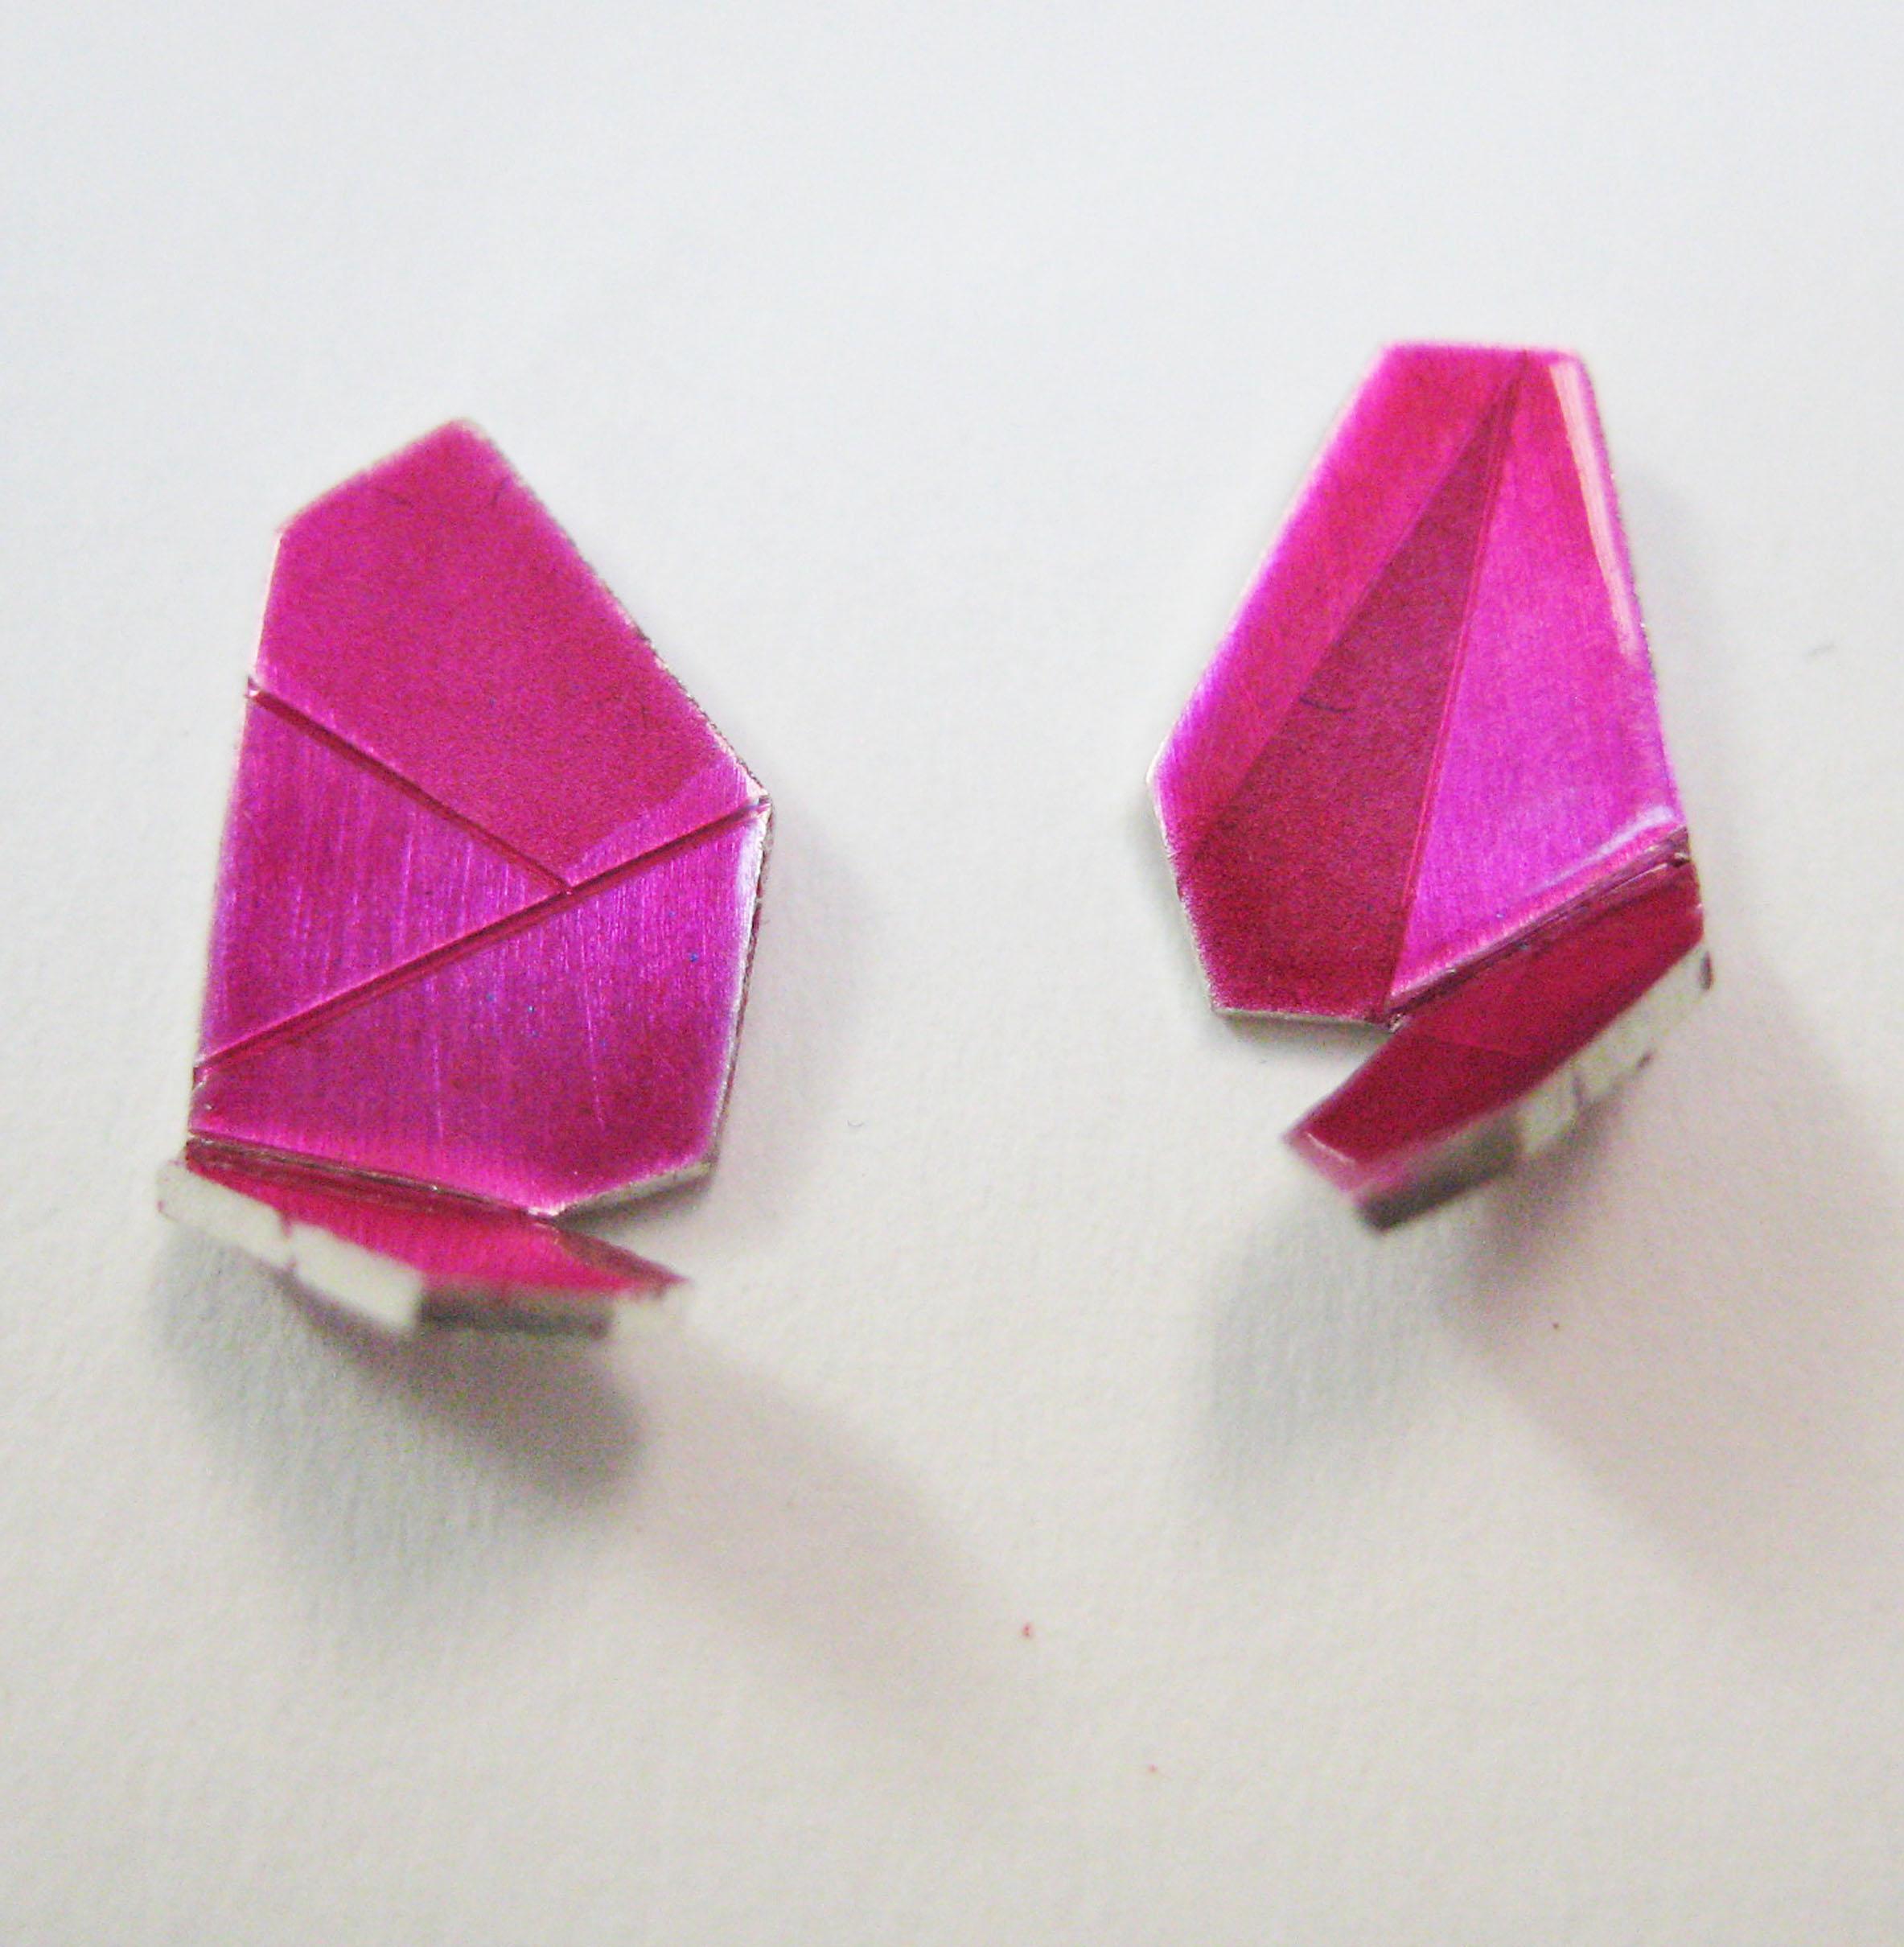 7-Small Raspberry Ear Gems-Voegele.jpg